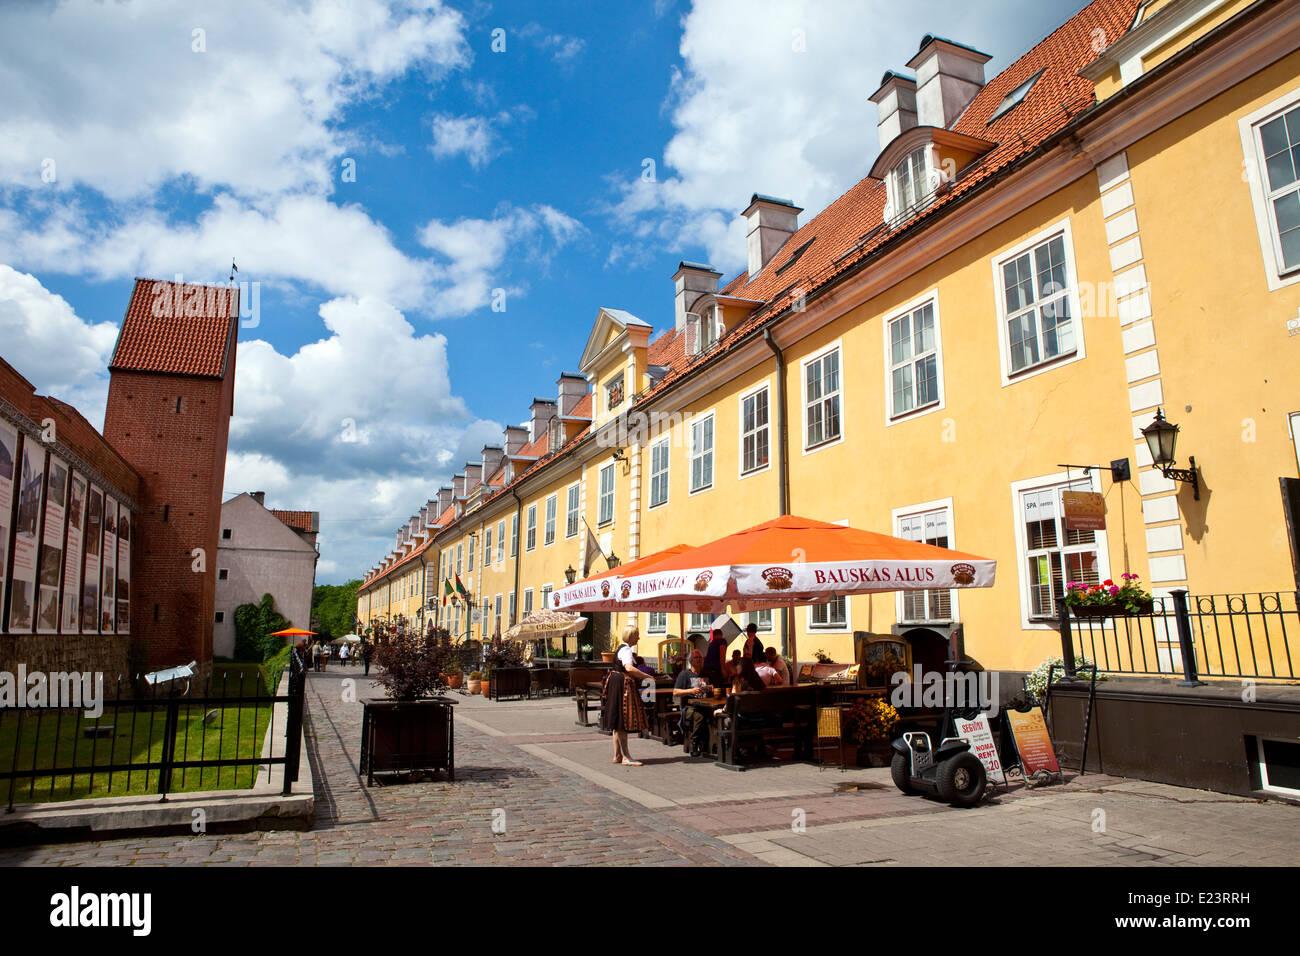 The beautiful architecture of Tornu Iela in Riga, Latvia. - Stock Image